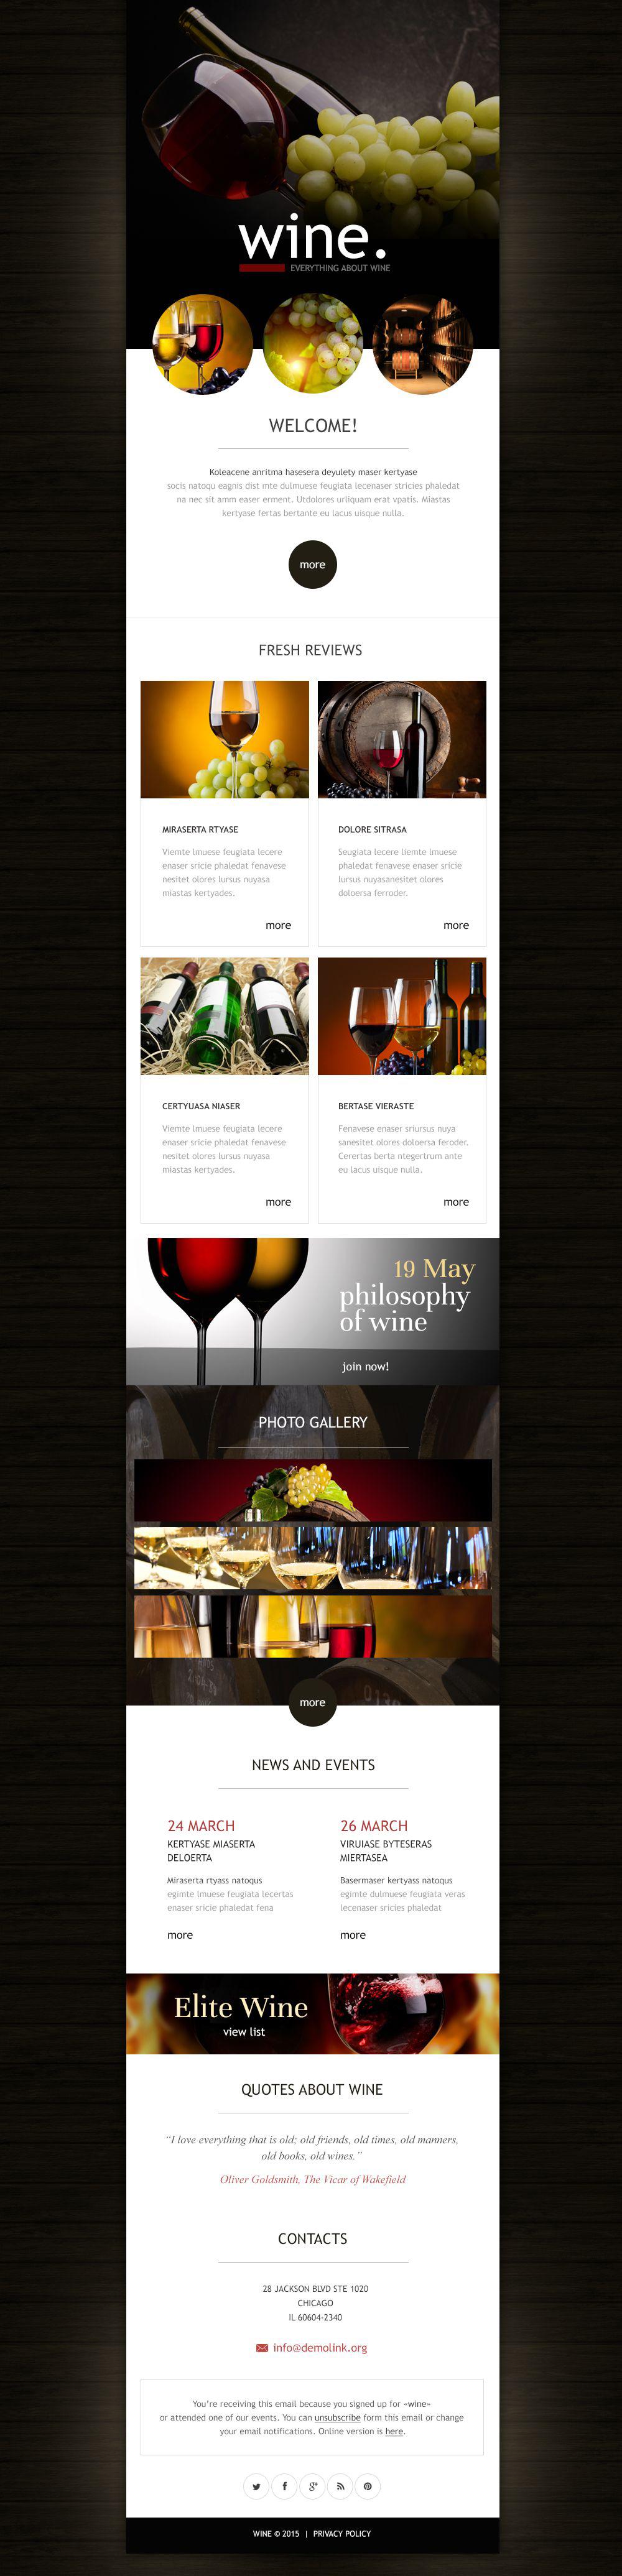 Responsywny szablon Newsletter #53029 na temat: wino - zrzut ekranu